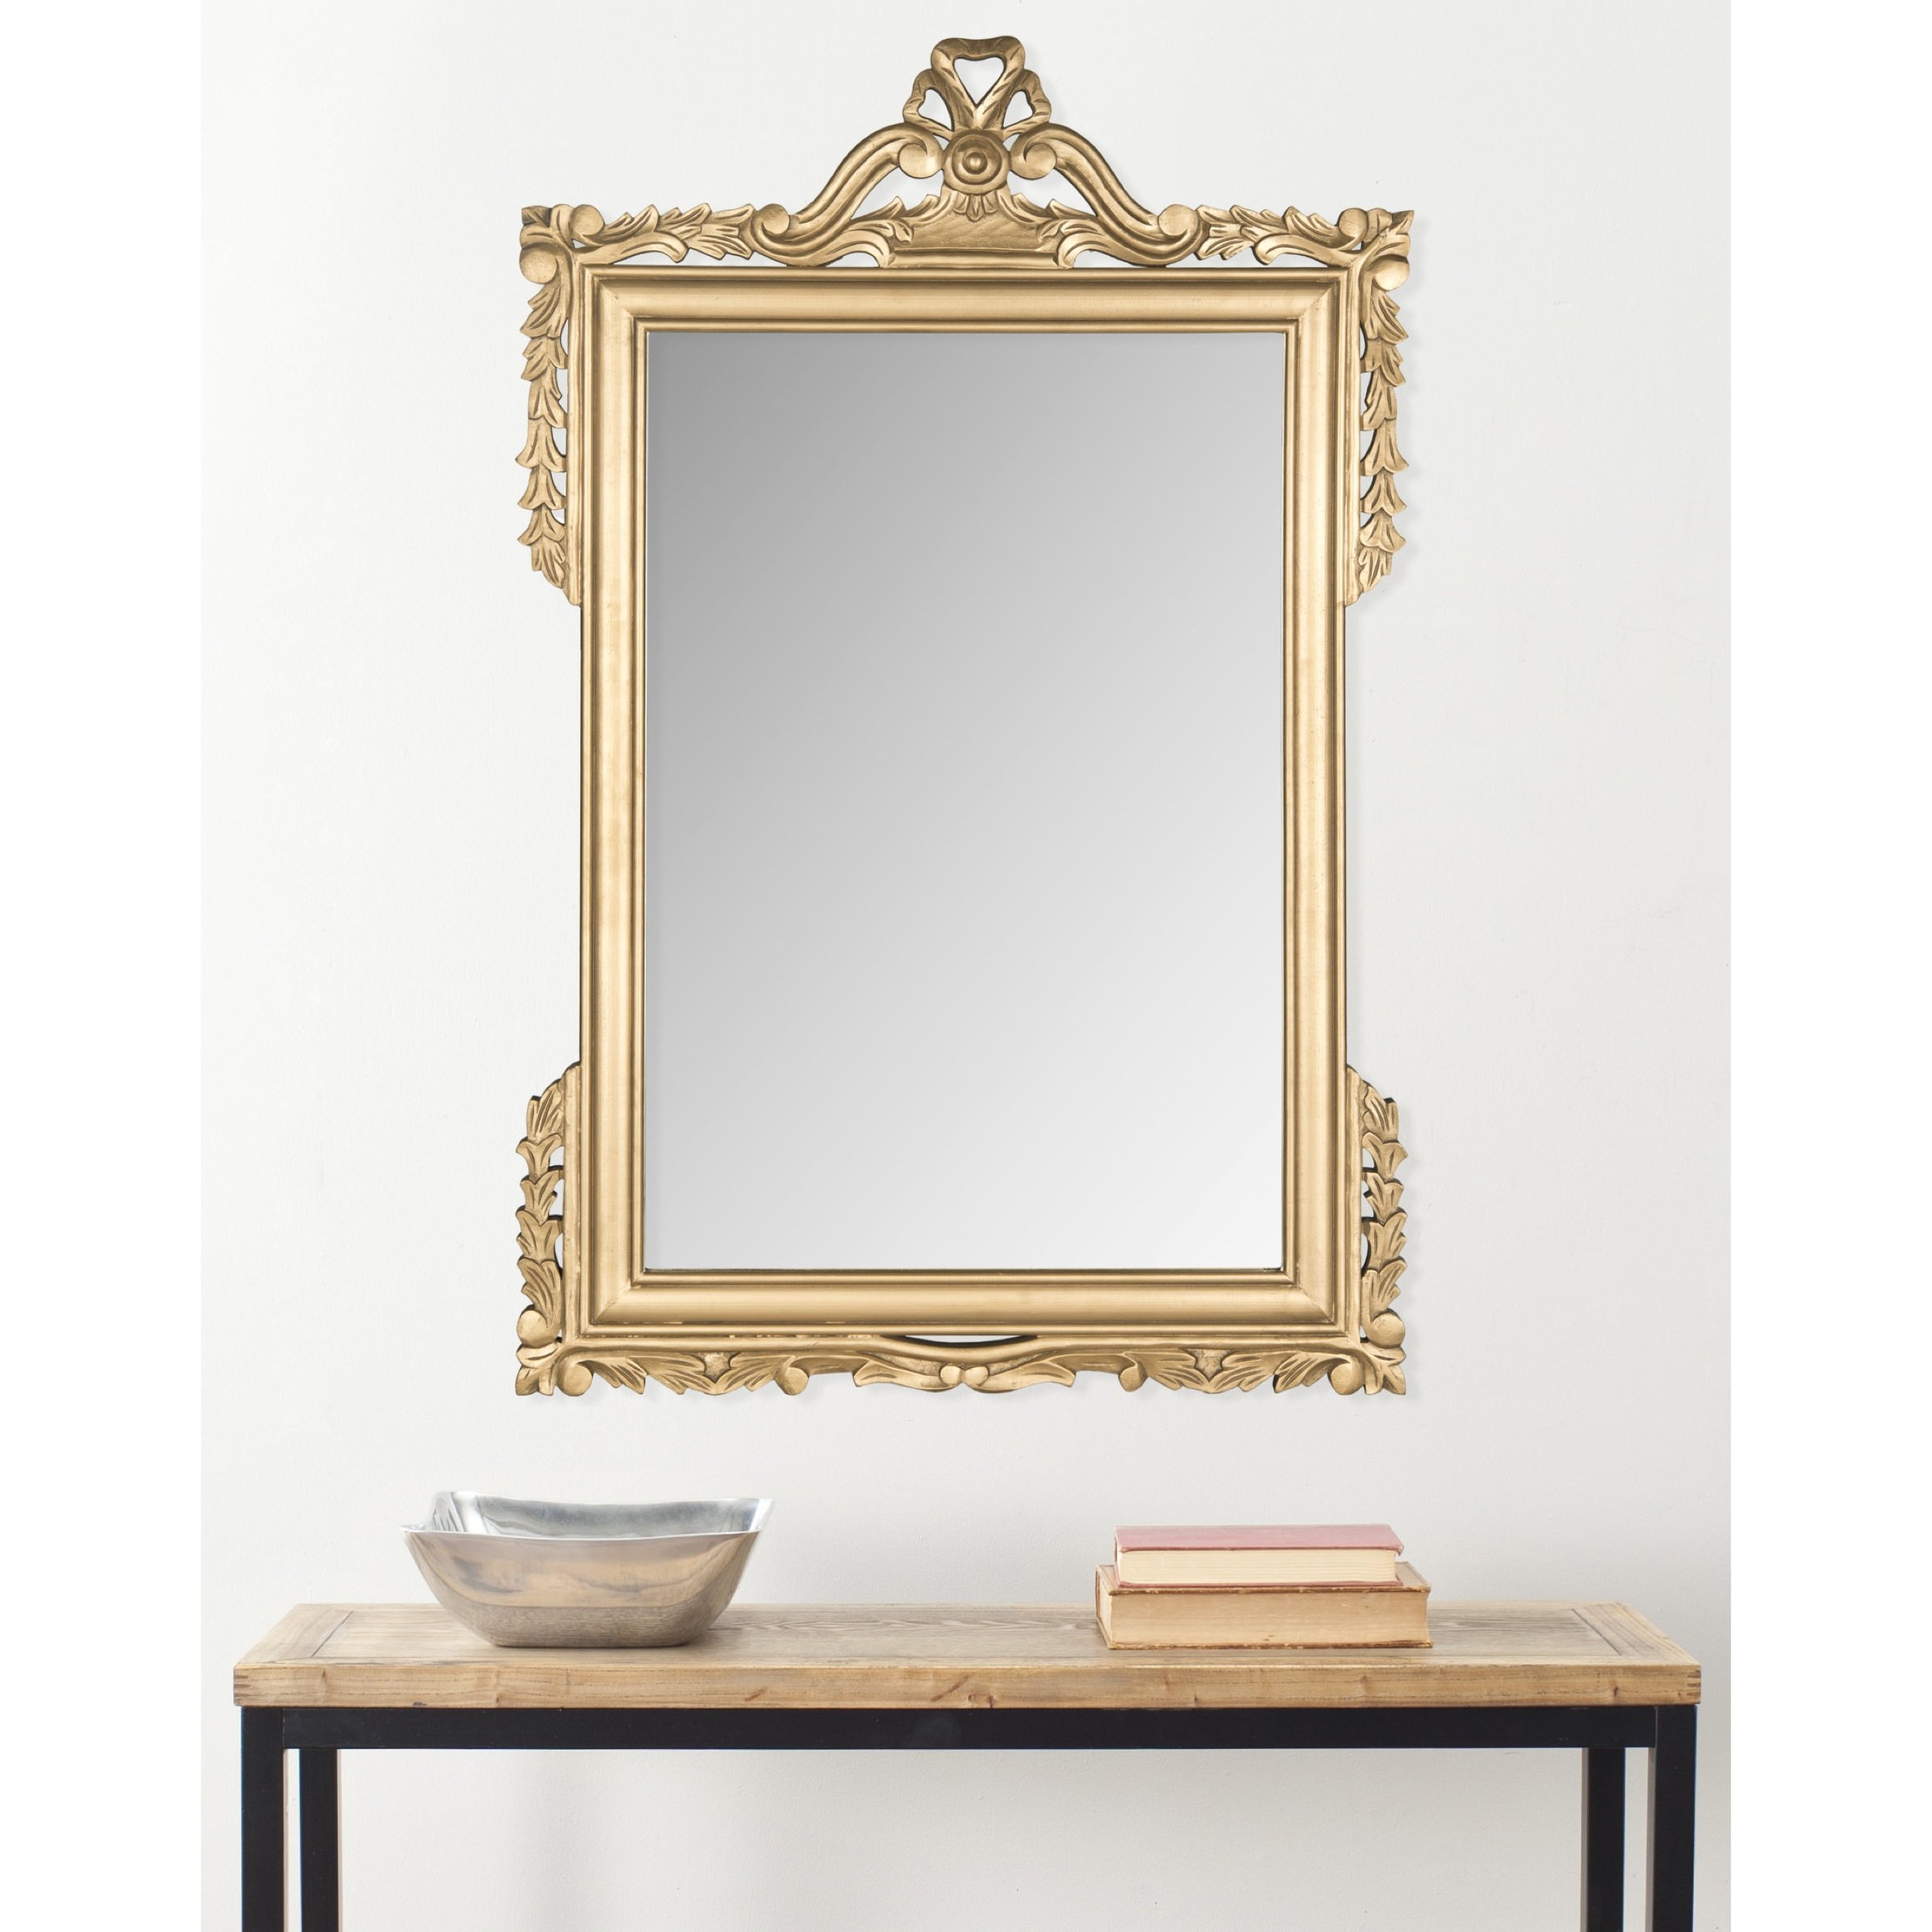 Shabby Elegance Wall Mirror   Wayfair In Epinal Shabby Elegance Wall Mirrors (View 17 of 20)